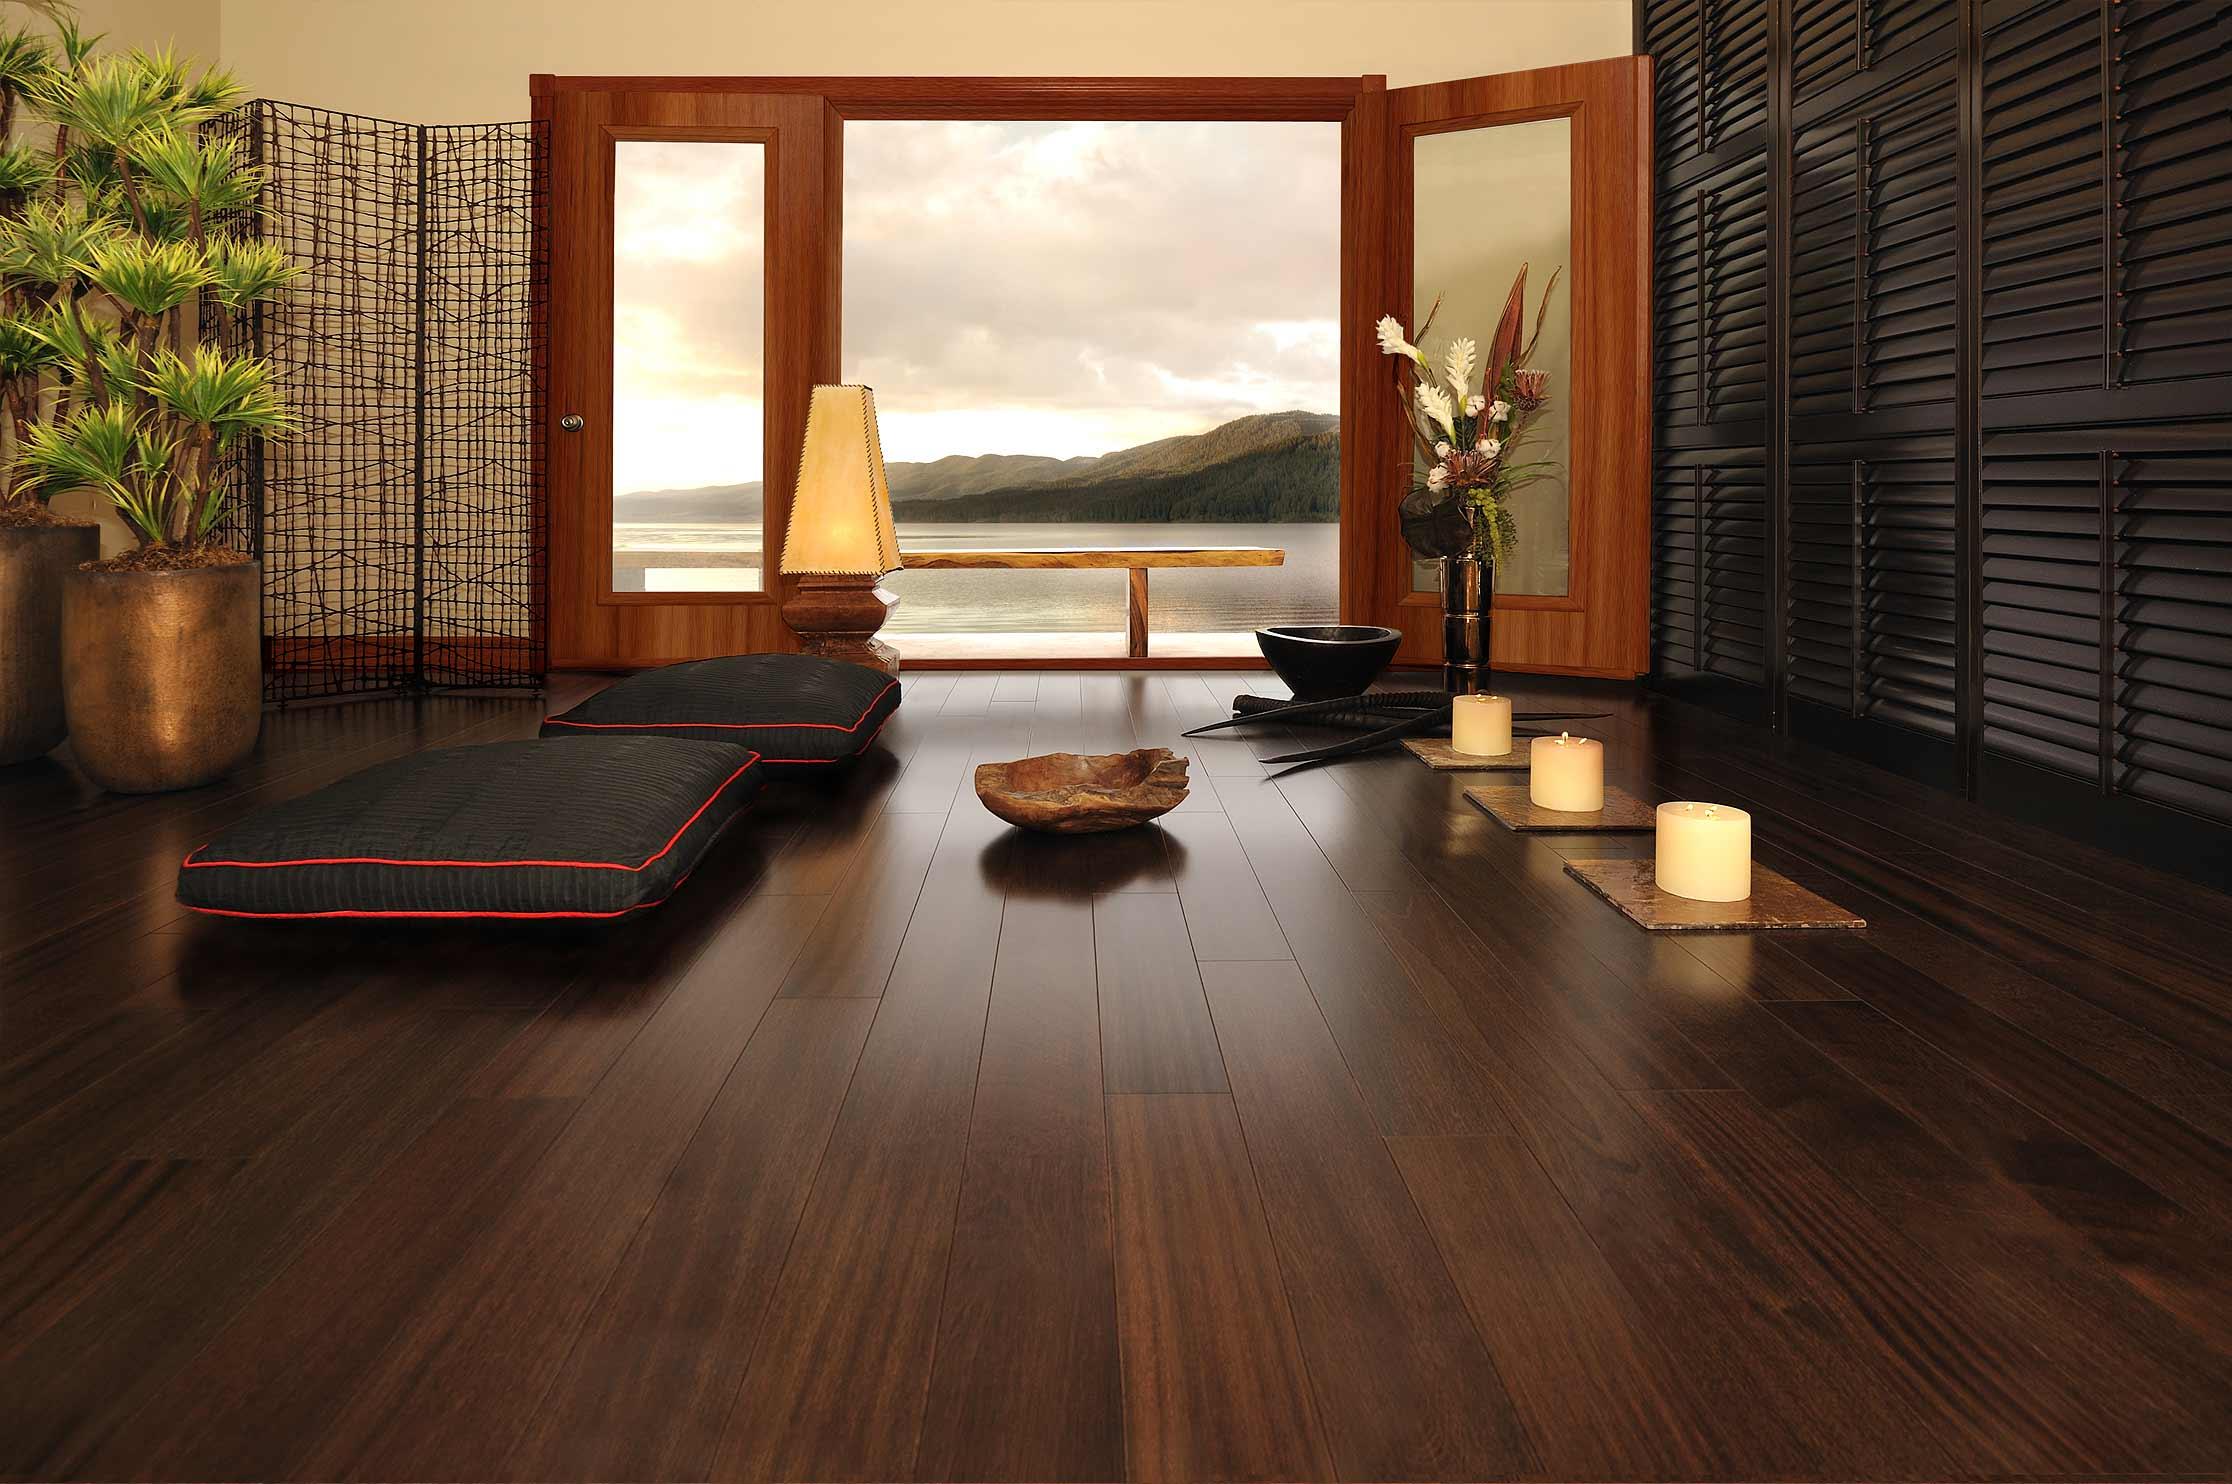 dining room flooring options photo - 1